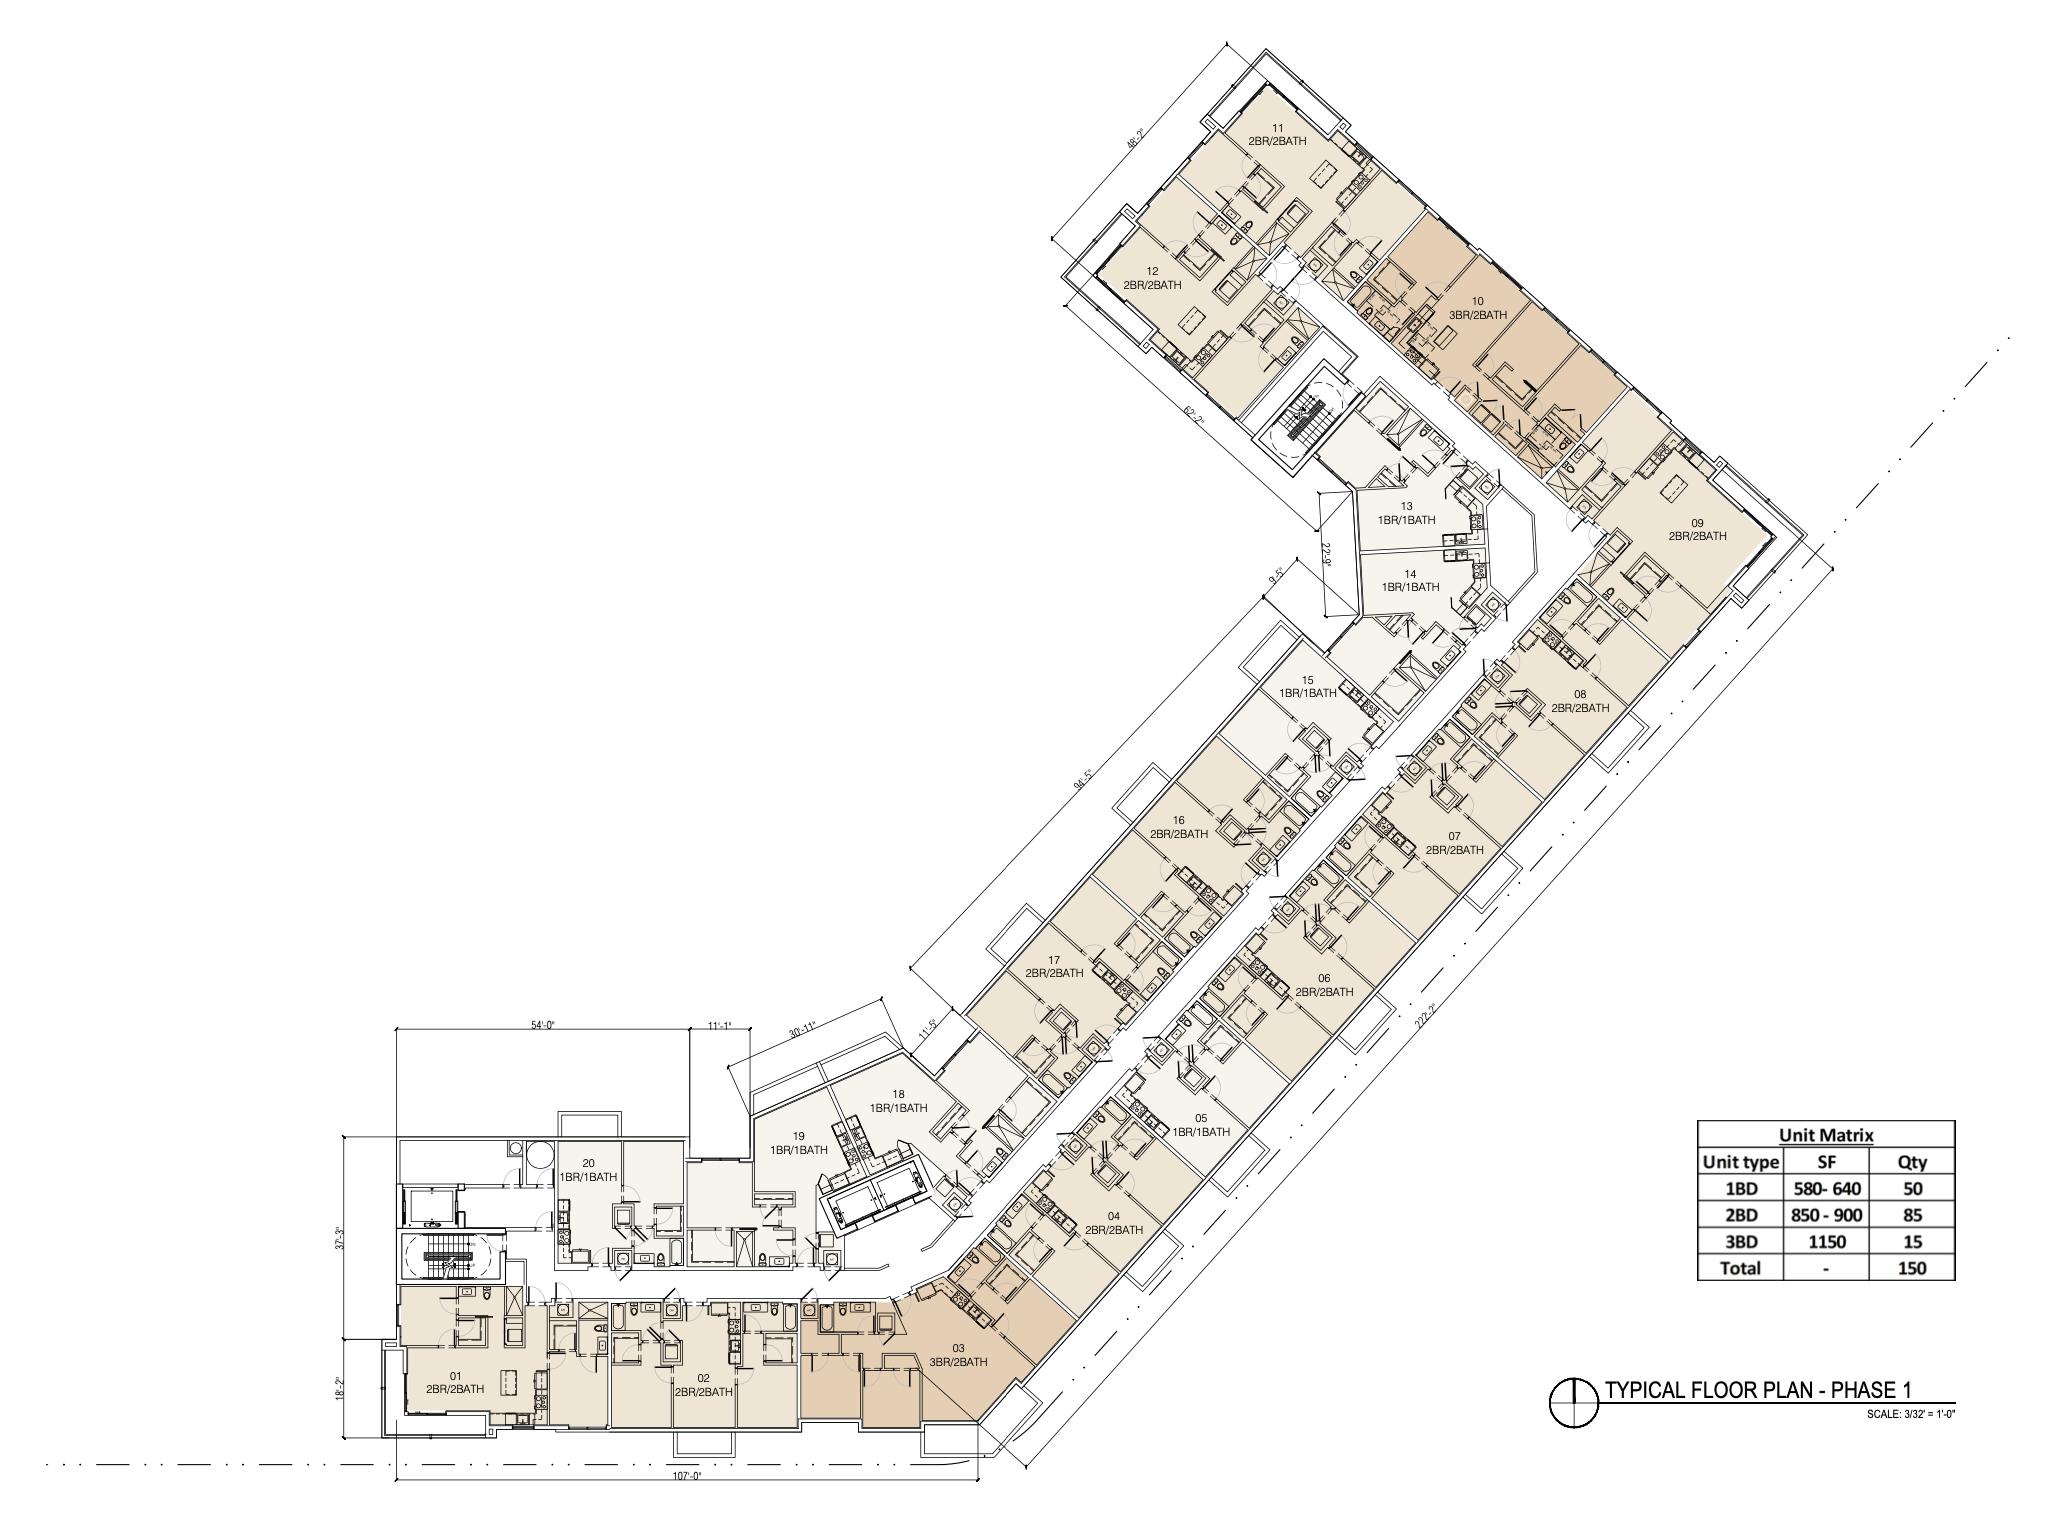 Typical Floor Plan. Designed by Behar Font & Partners.